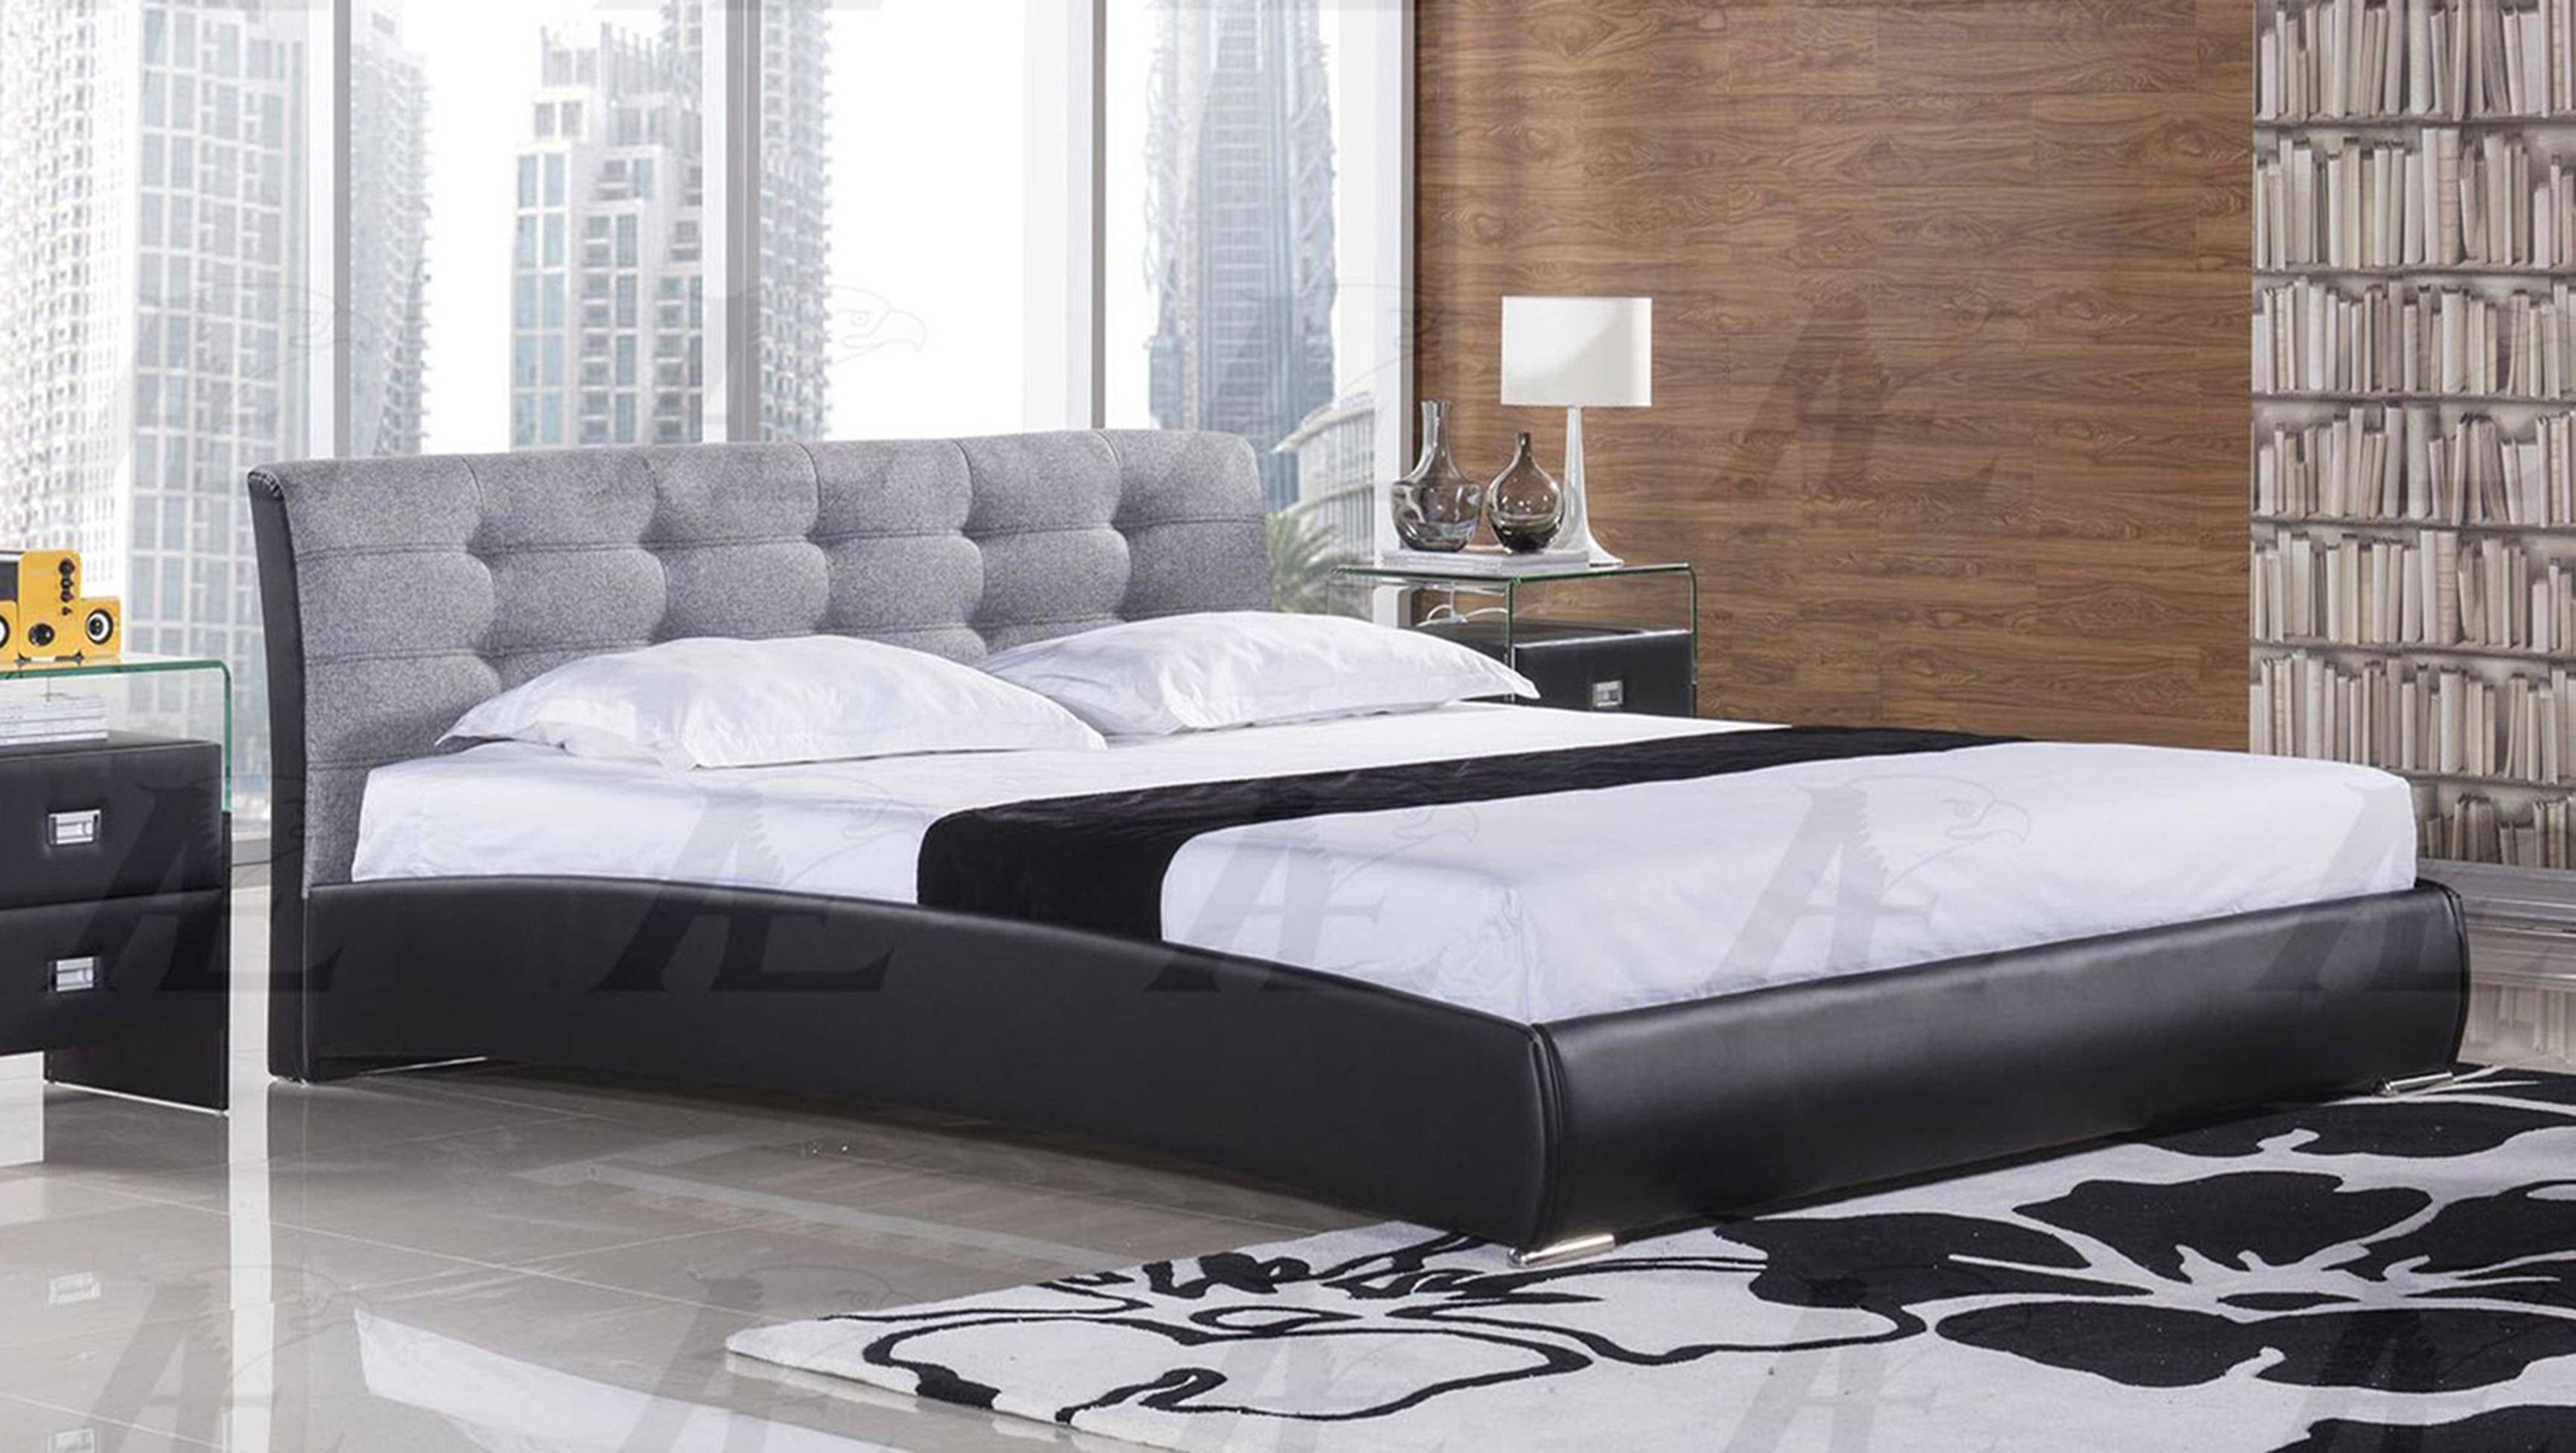 Cheap Bedroom Set Online Best Of American Eagle B D055 Queen Platform Bed In Gray Fabric